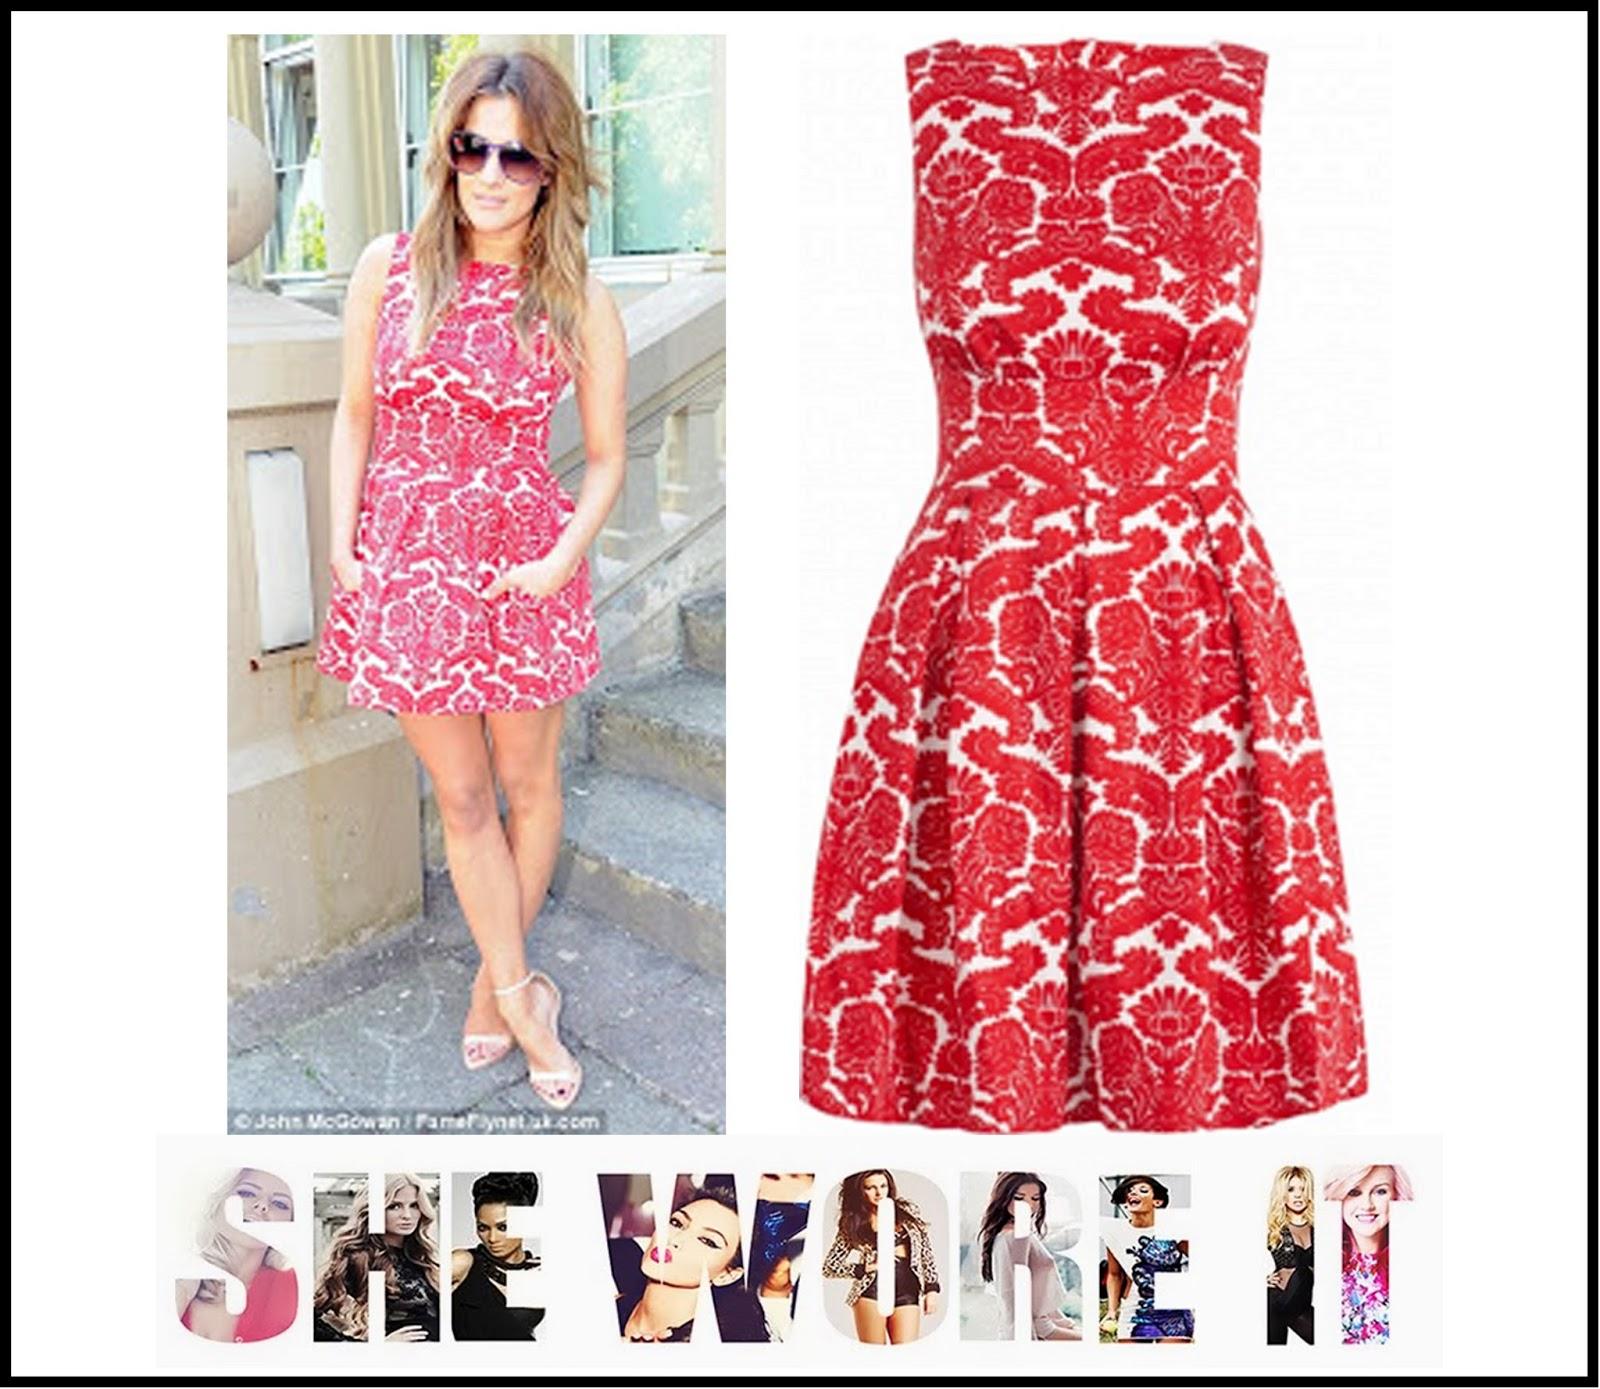 9847846cd385 Caroline Flack s Closet Red   White Sleeveless Lace Print Skater ...